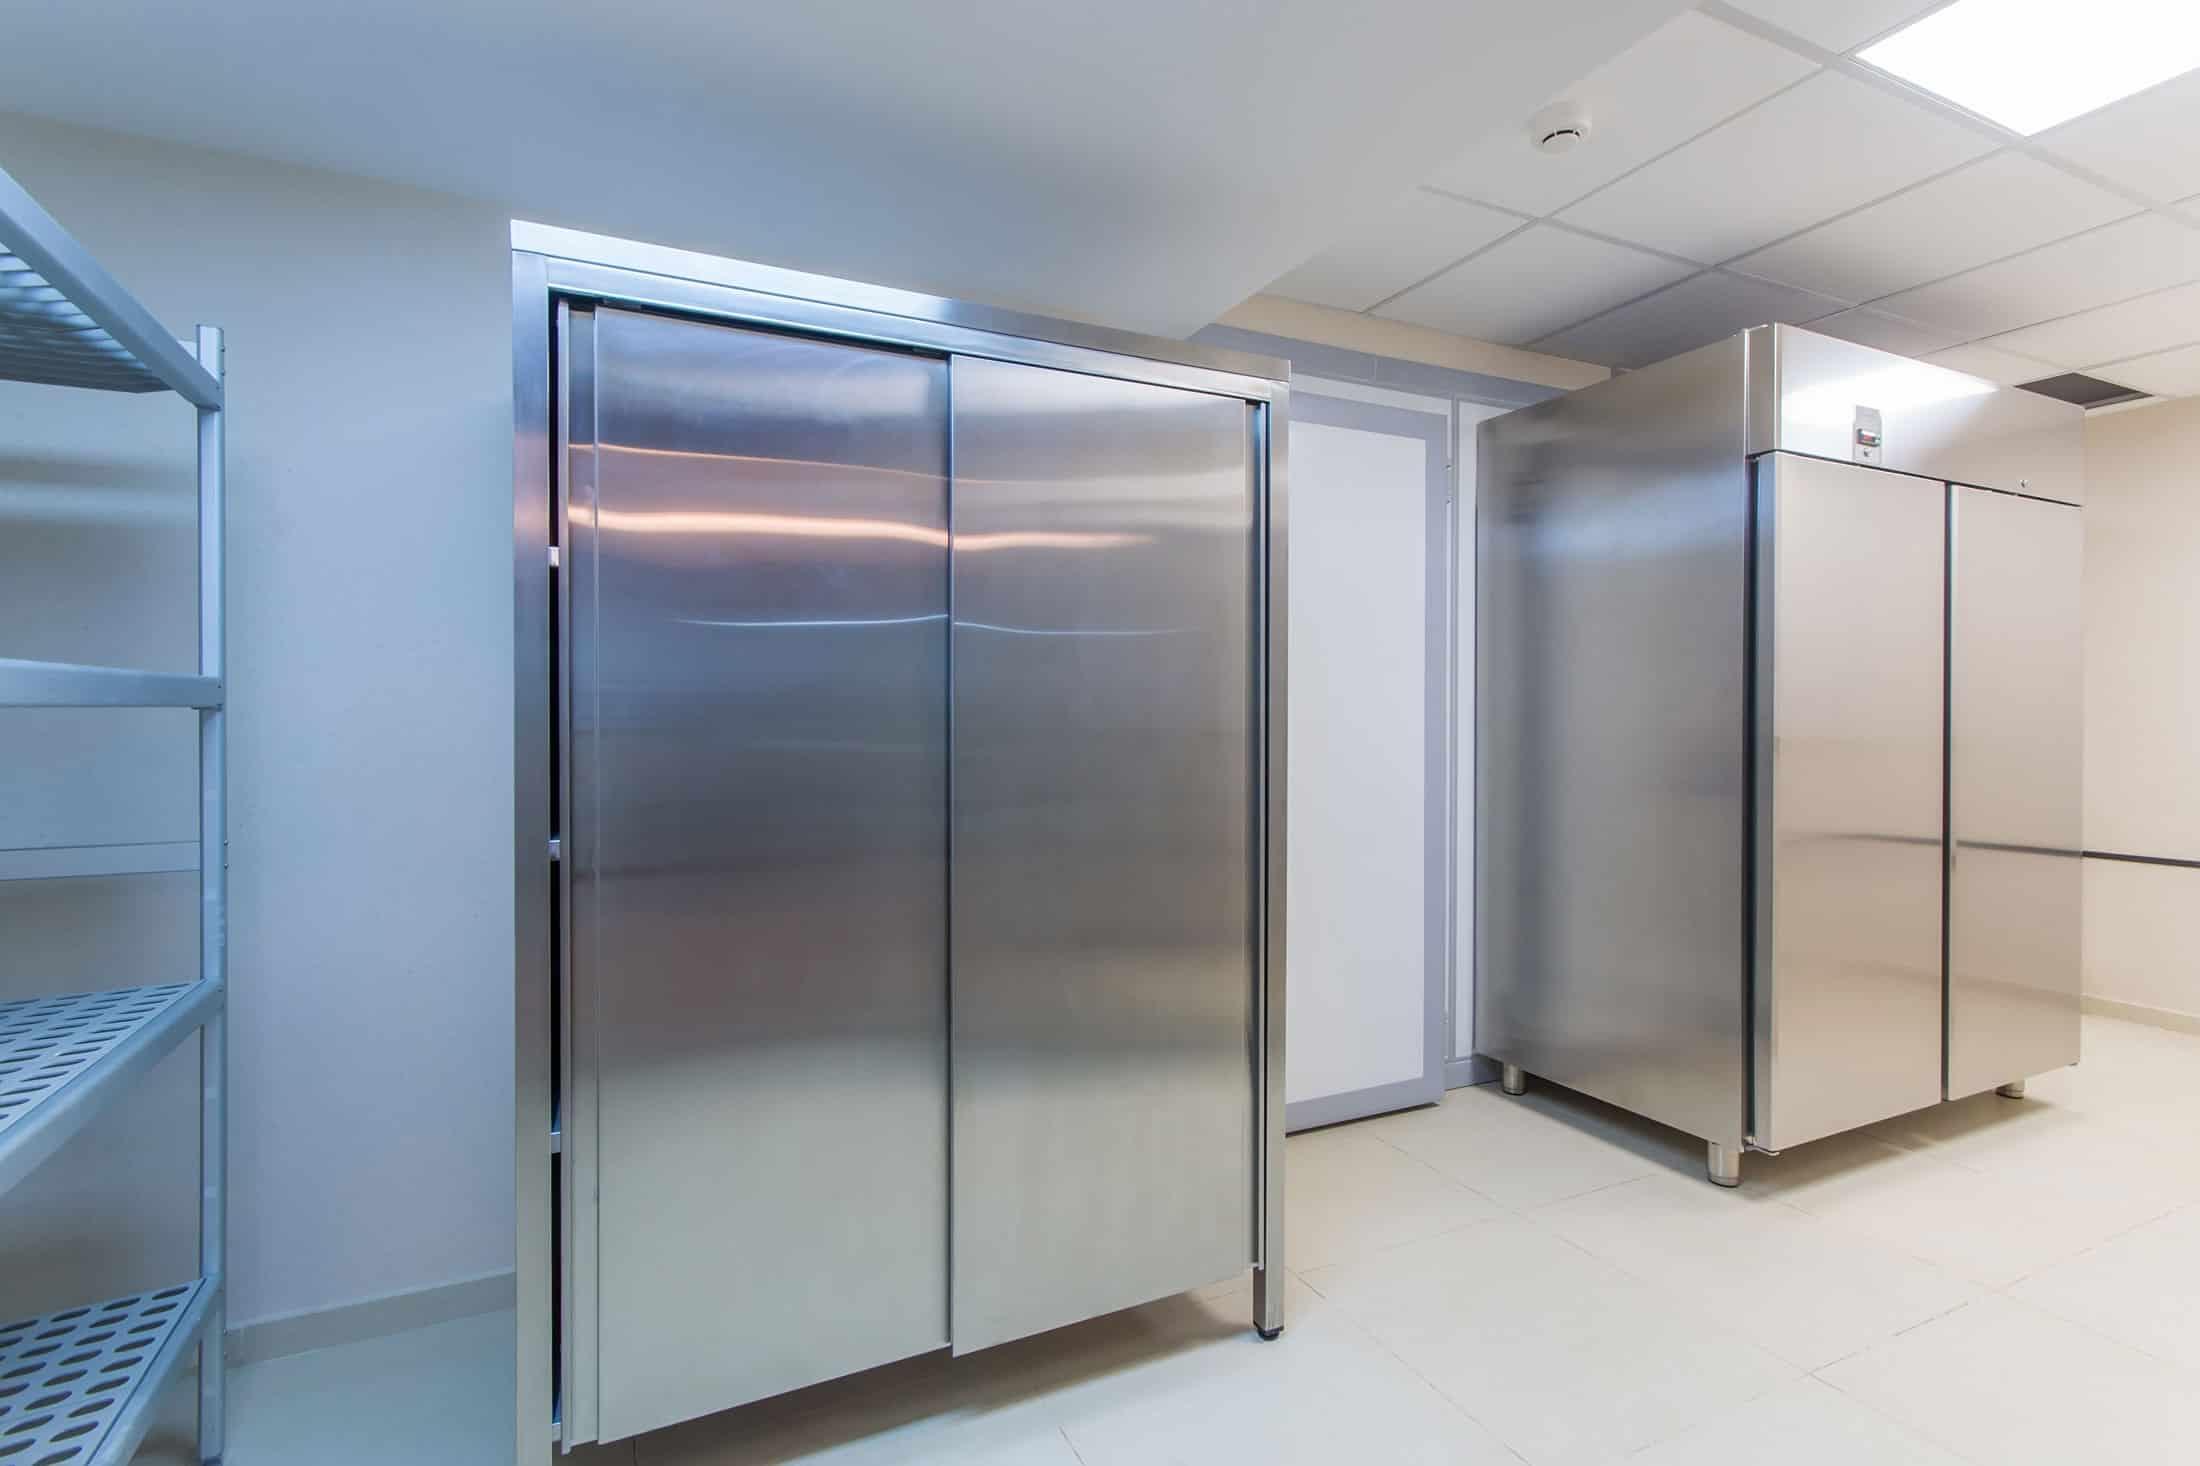 commercial-refrigerator